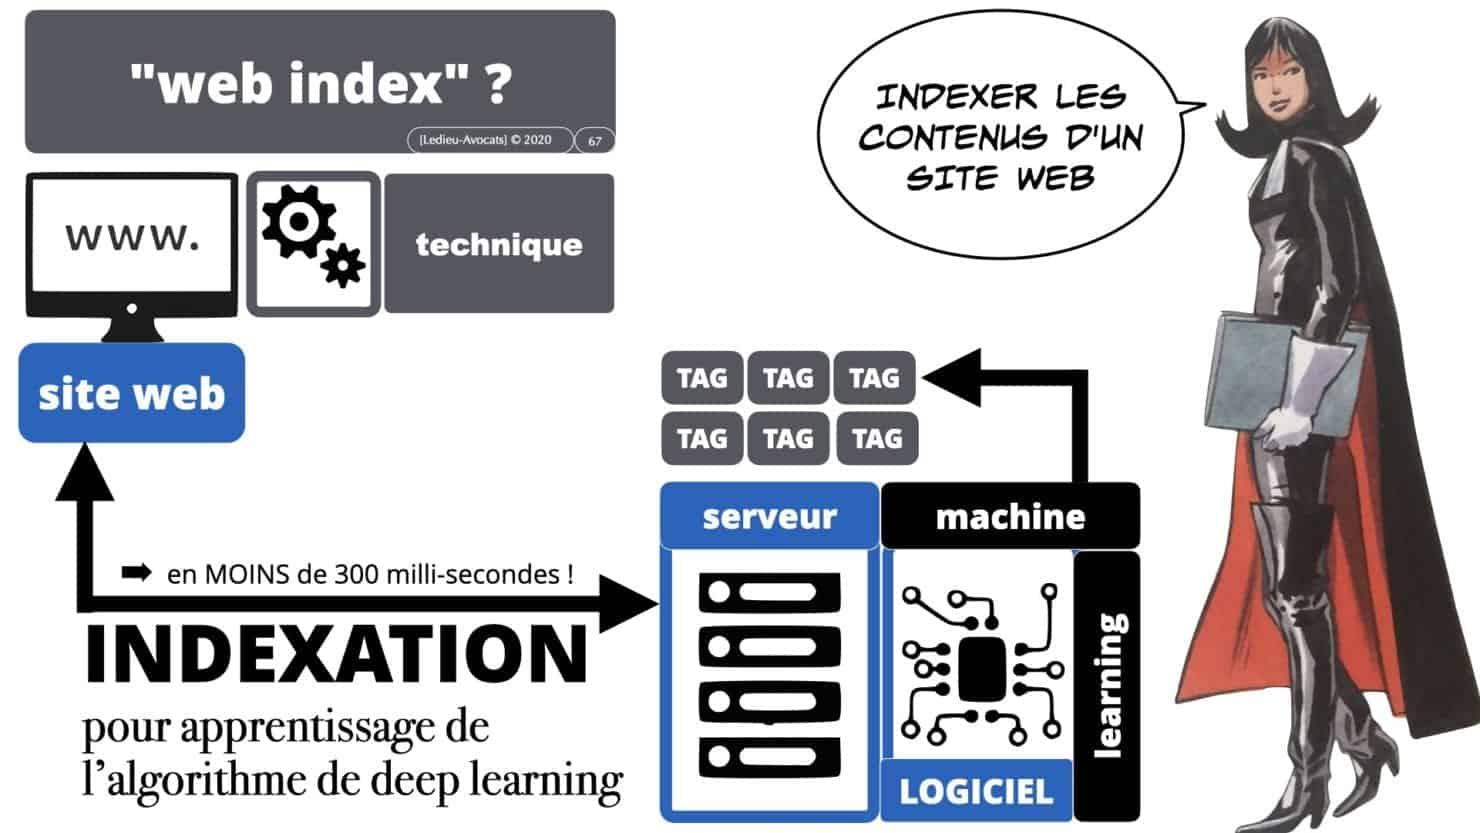 307 Intelligence artificielle-machine-learning-deep-learning-base de données-BIG-DATA *16:9* Constellation ©Ledieu-Avocat-13-10-2020.067